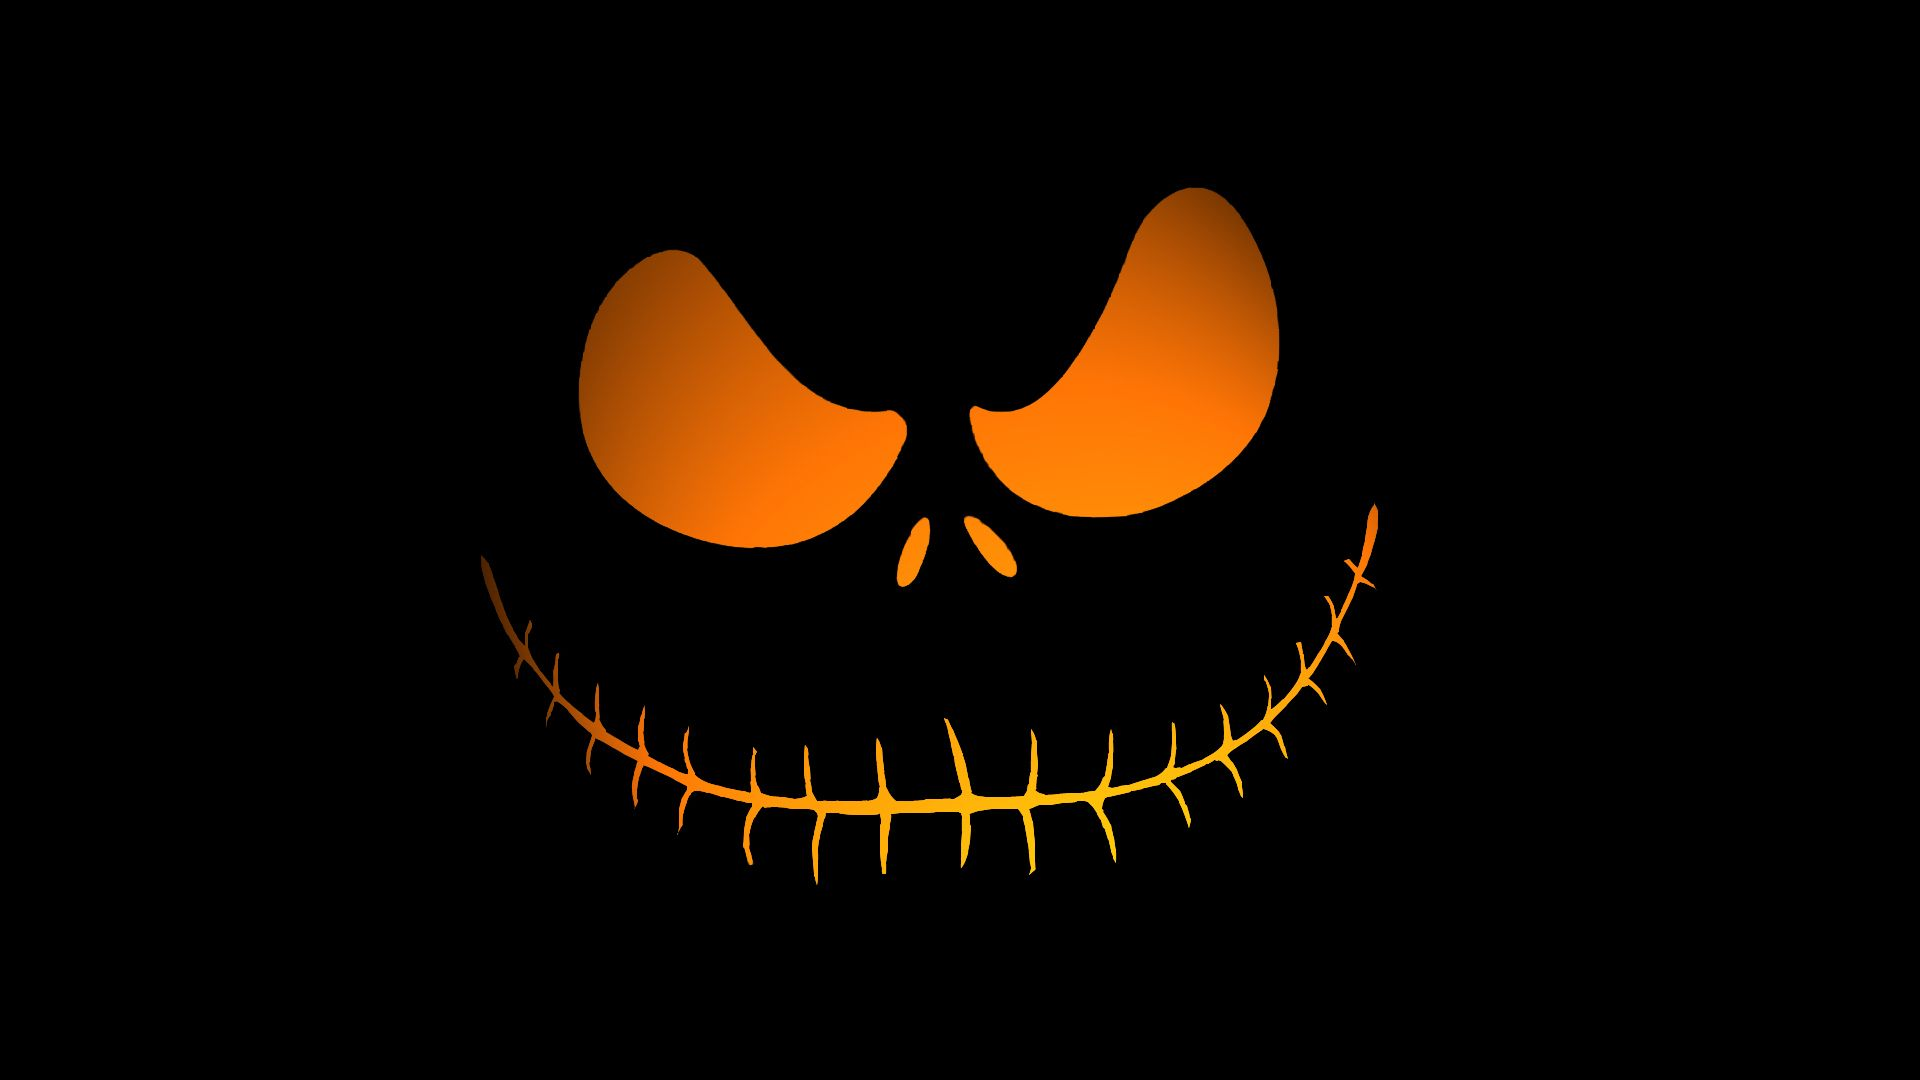 Hd Wallpaper Halloween Hd Best Full Hd Wallpapers HD Wallpapers Download Free Images Wallpaper [1000image.com]